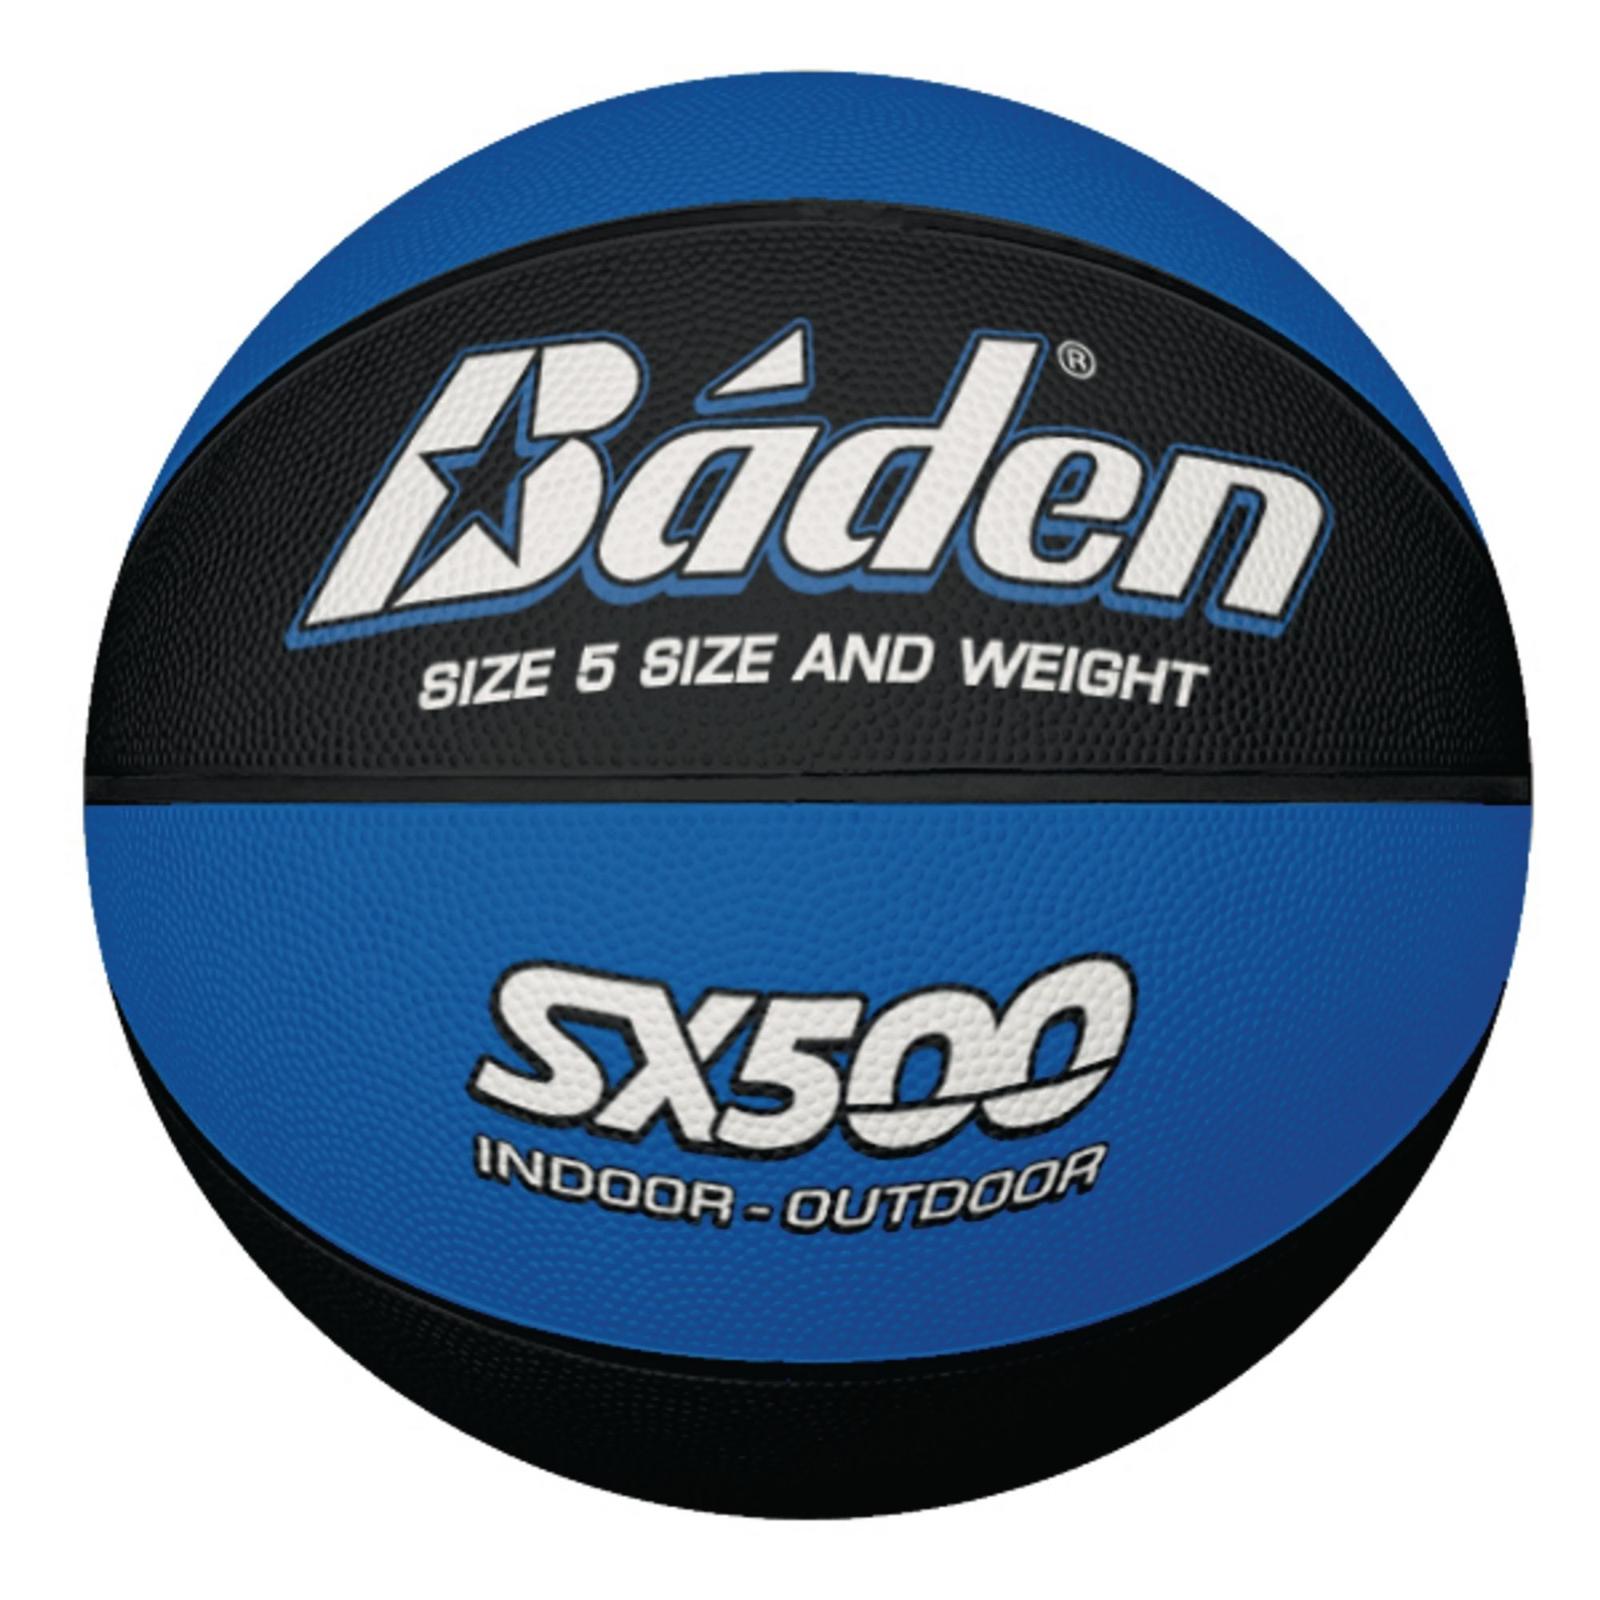 Baden SX500 Basketball - Size 5 - Blue/Black